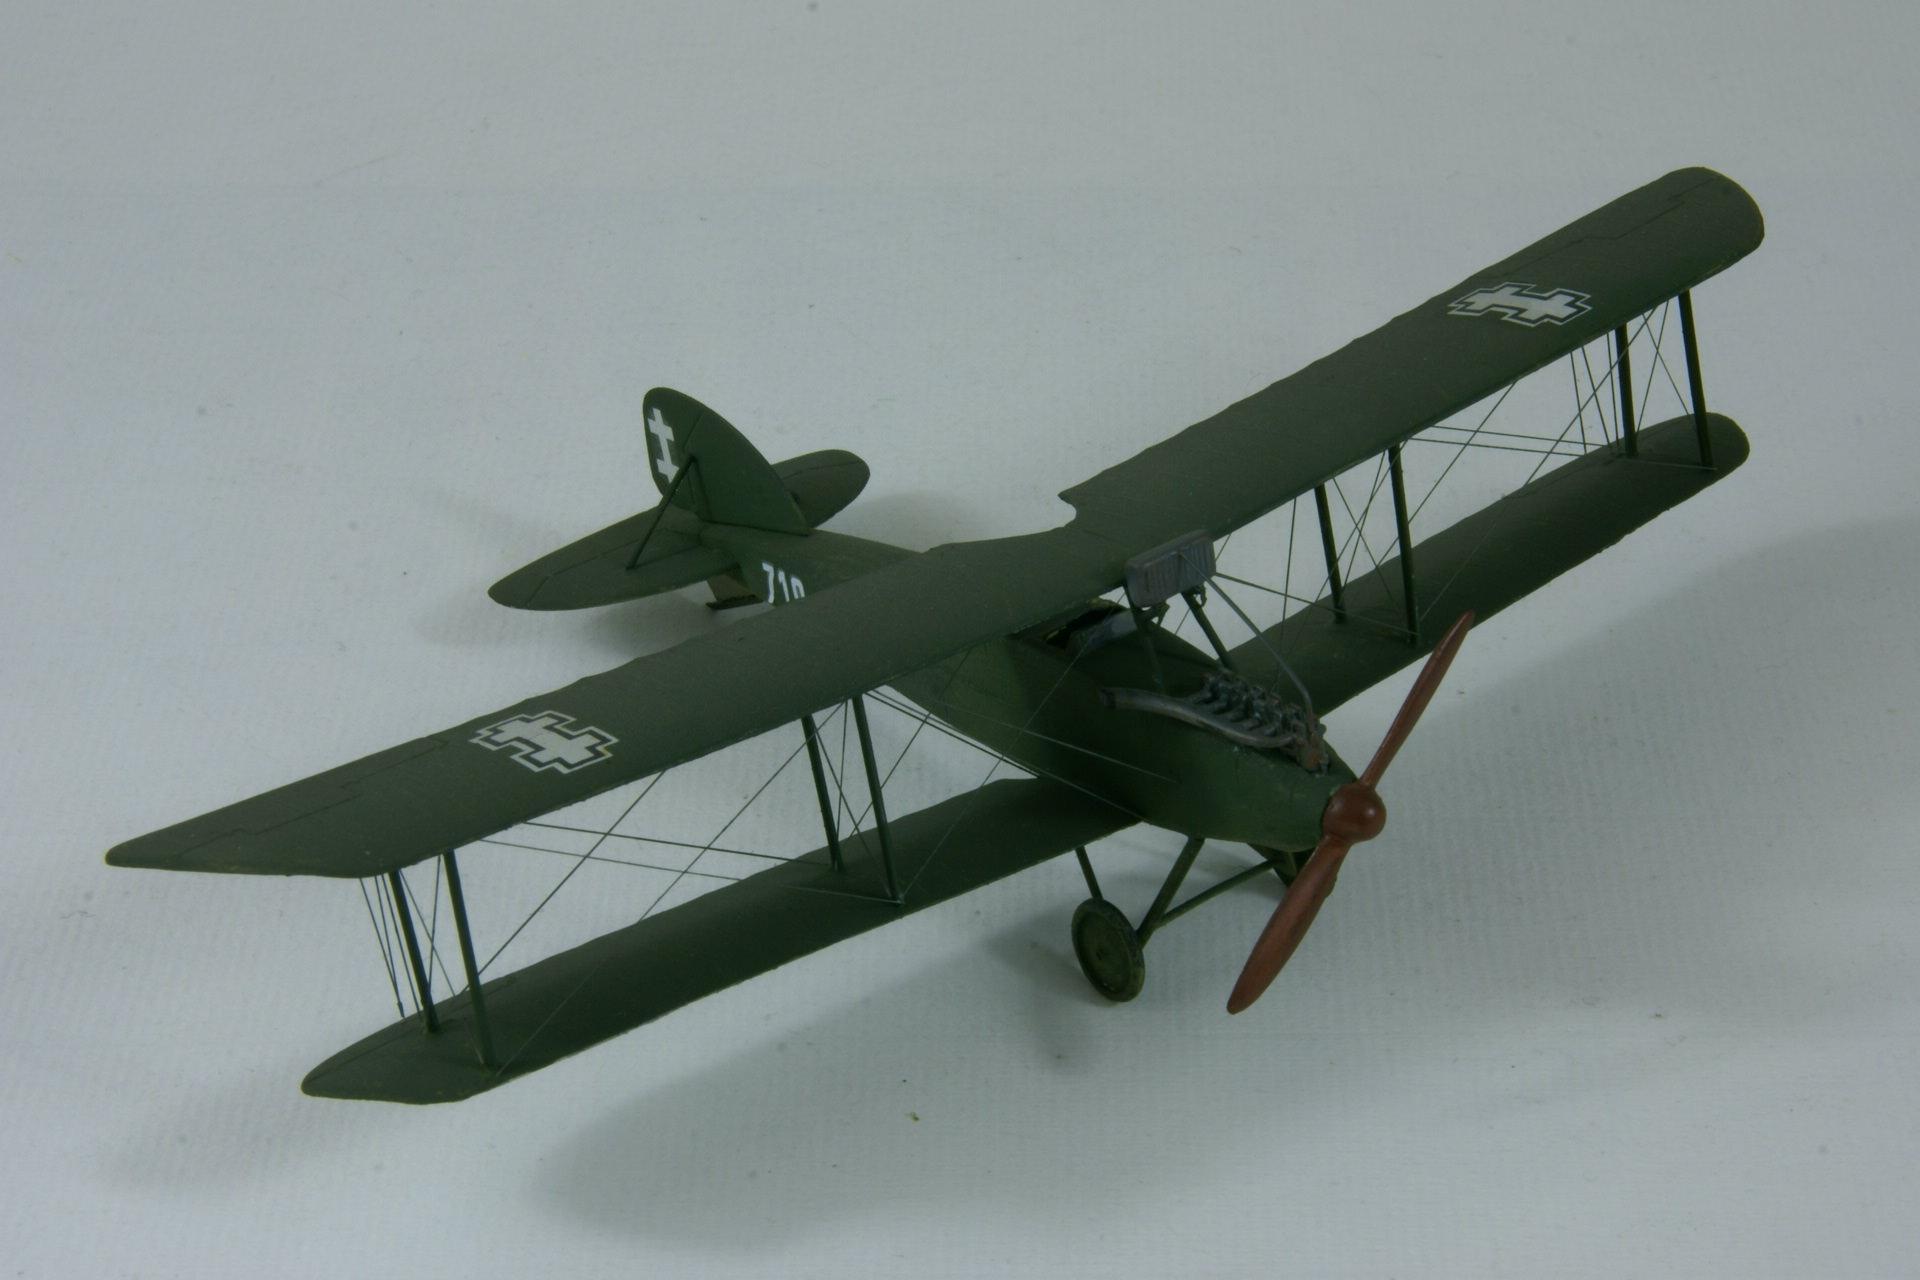 Albatros j ii 5